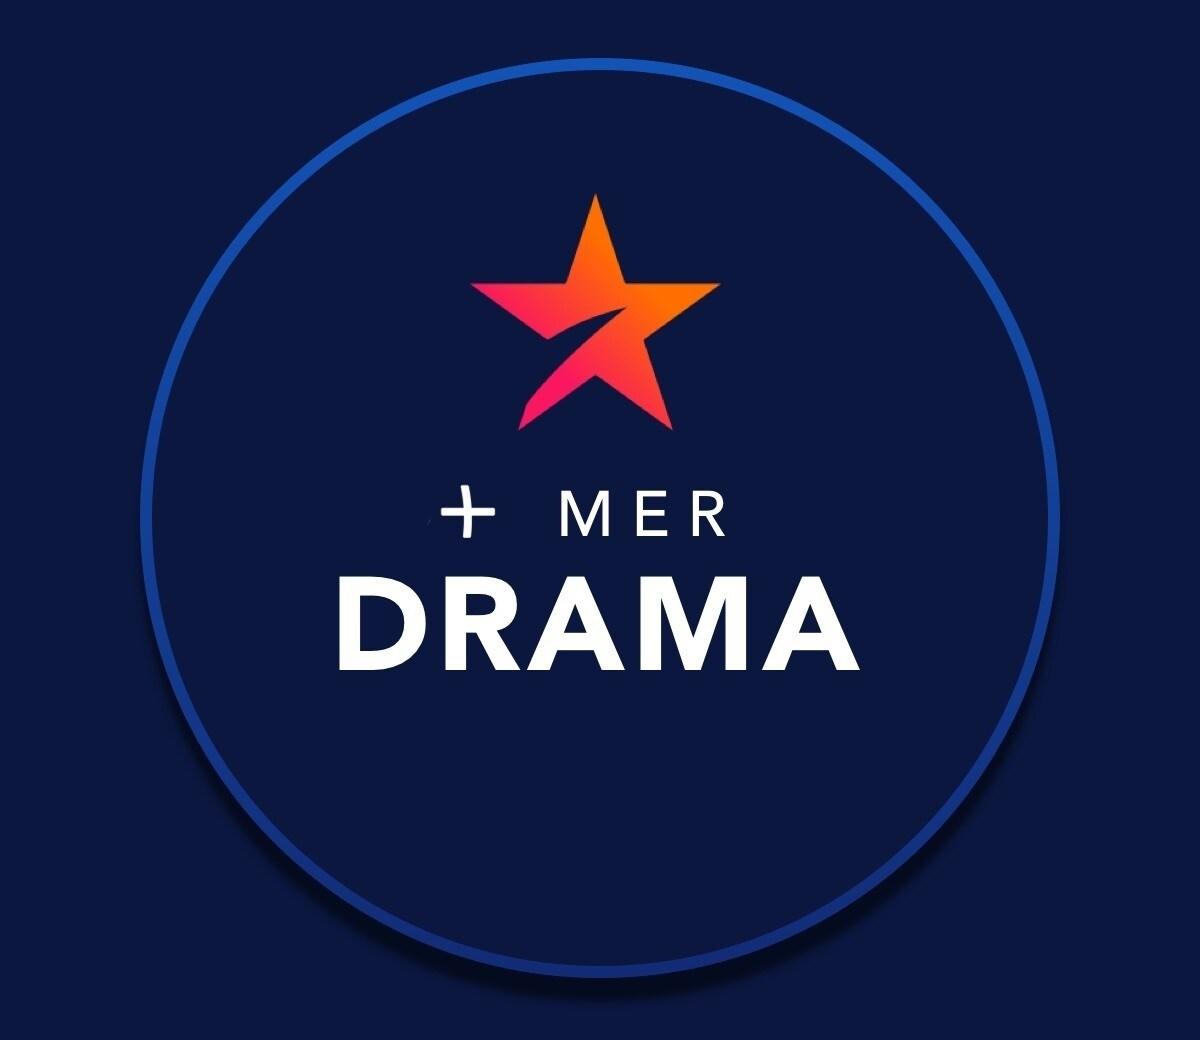 + Mer drama